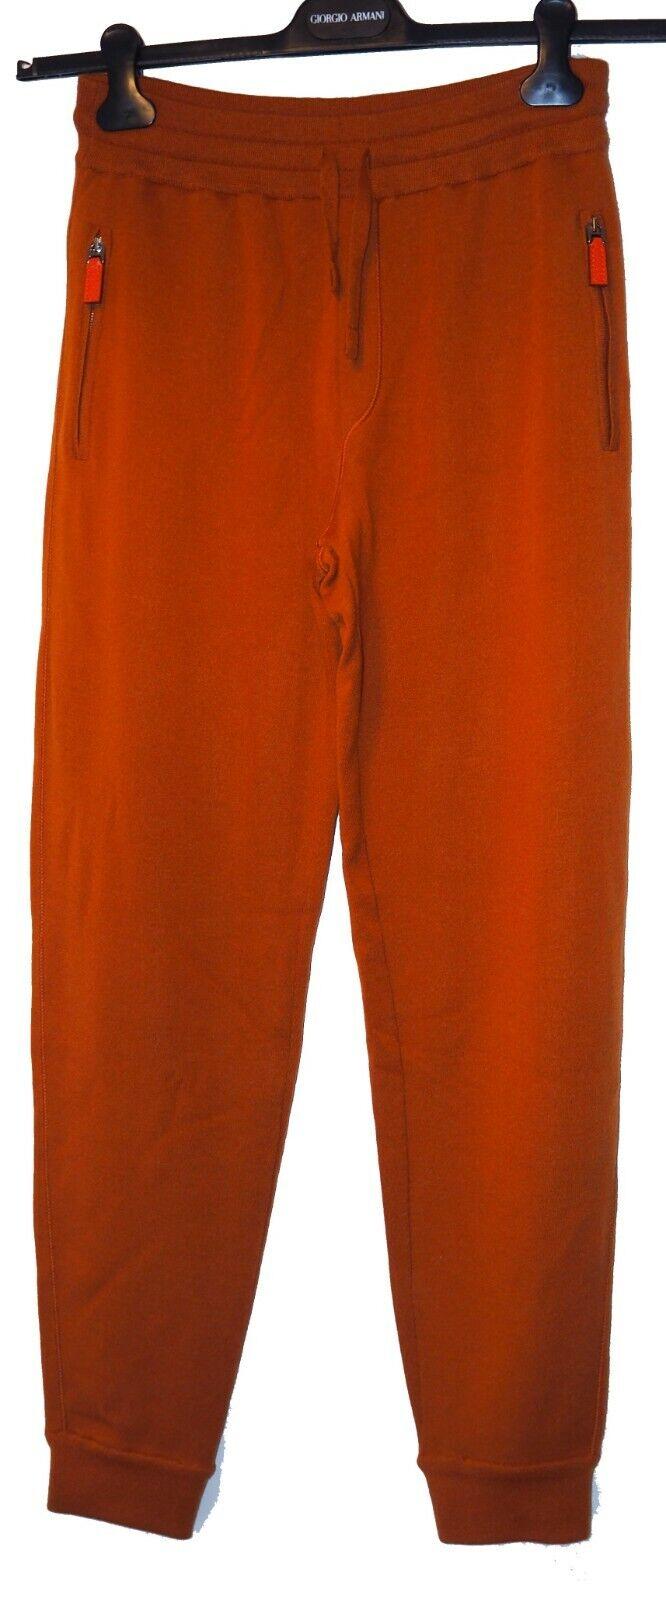 Dolce & Gabbana Burnt Orange Pure Cashmere Joggers Pants Trousers Size S